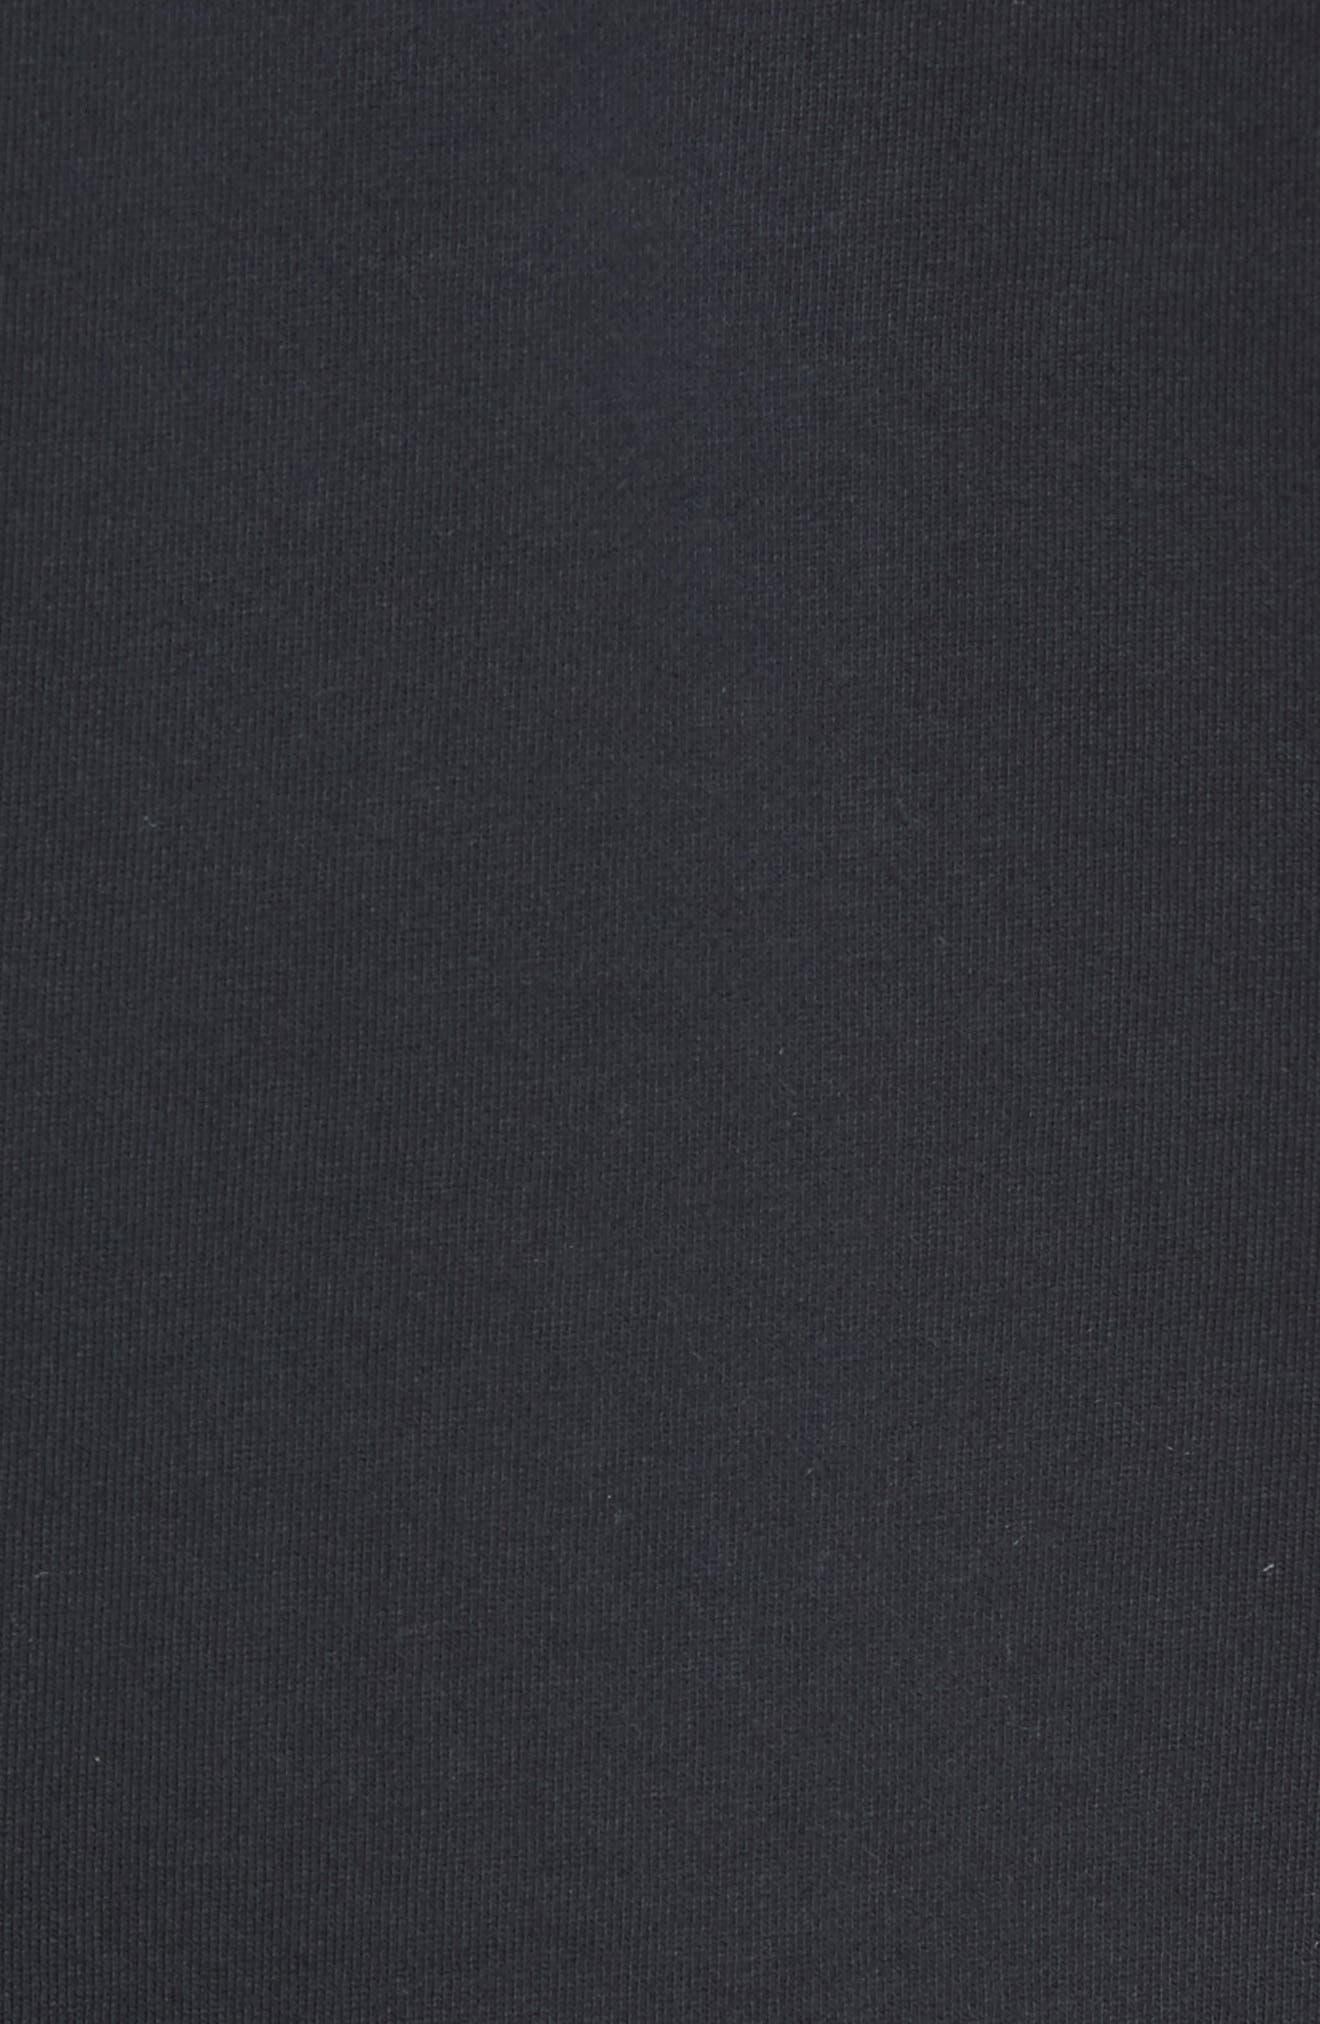 NFL Championship - Pittsburgh Steelers Sweatshirt,                             Alternate thumbnail 5, color,                             001